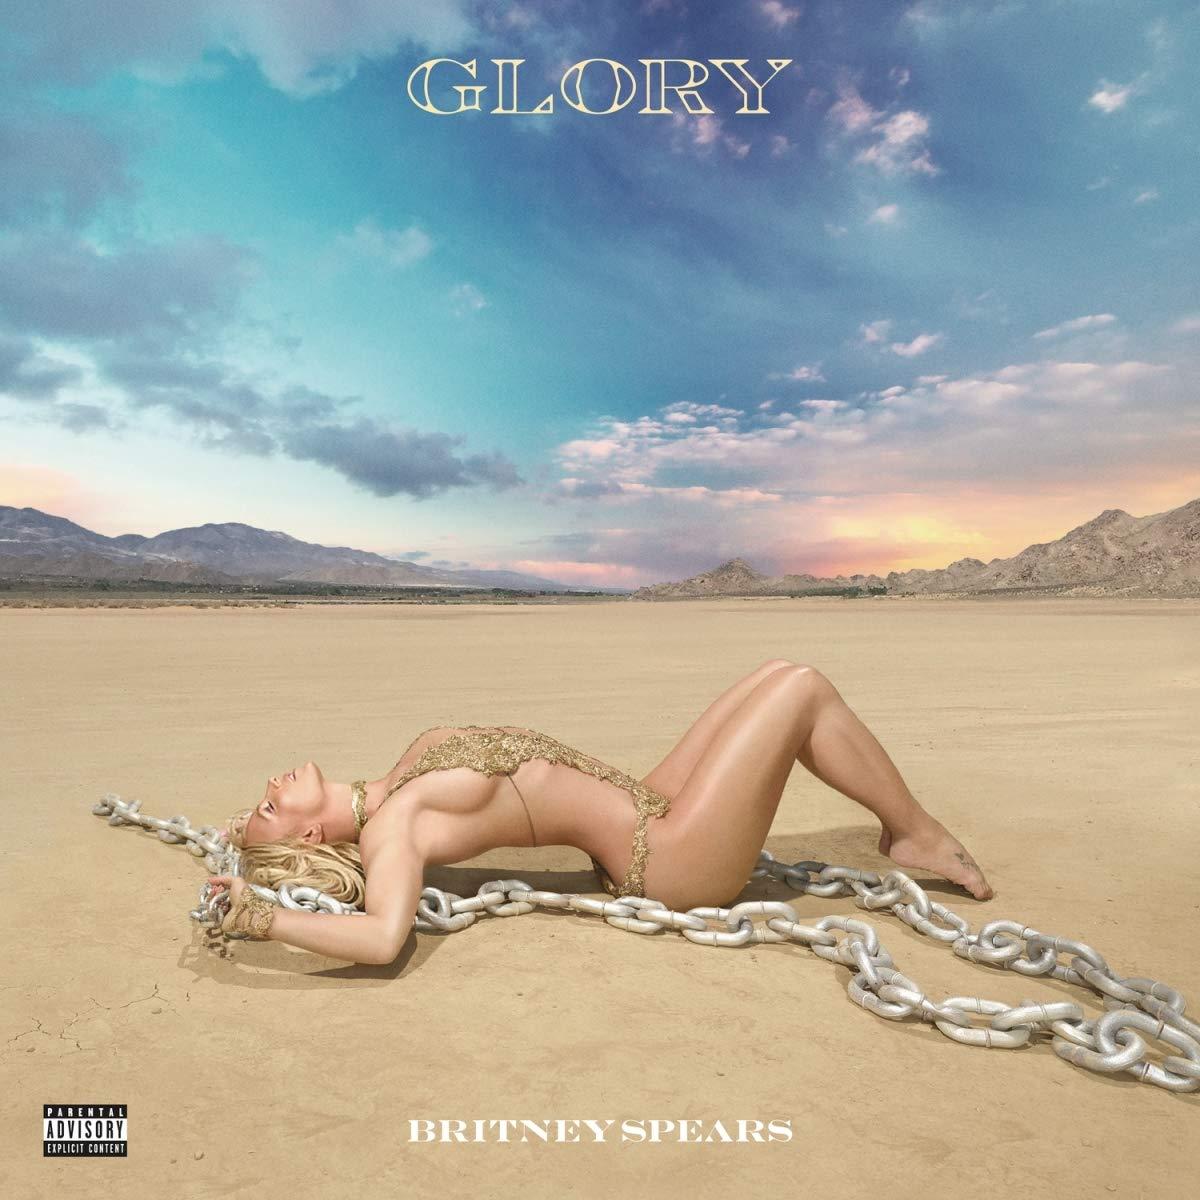 Britney Spears - Glory (Deluxe Version) - Amazon.com Music